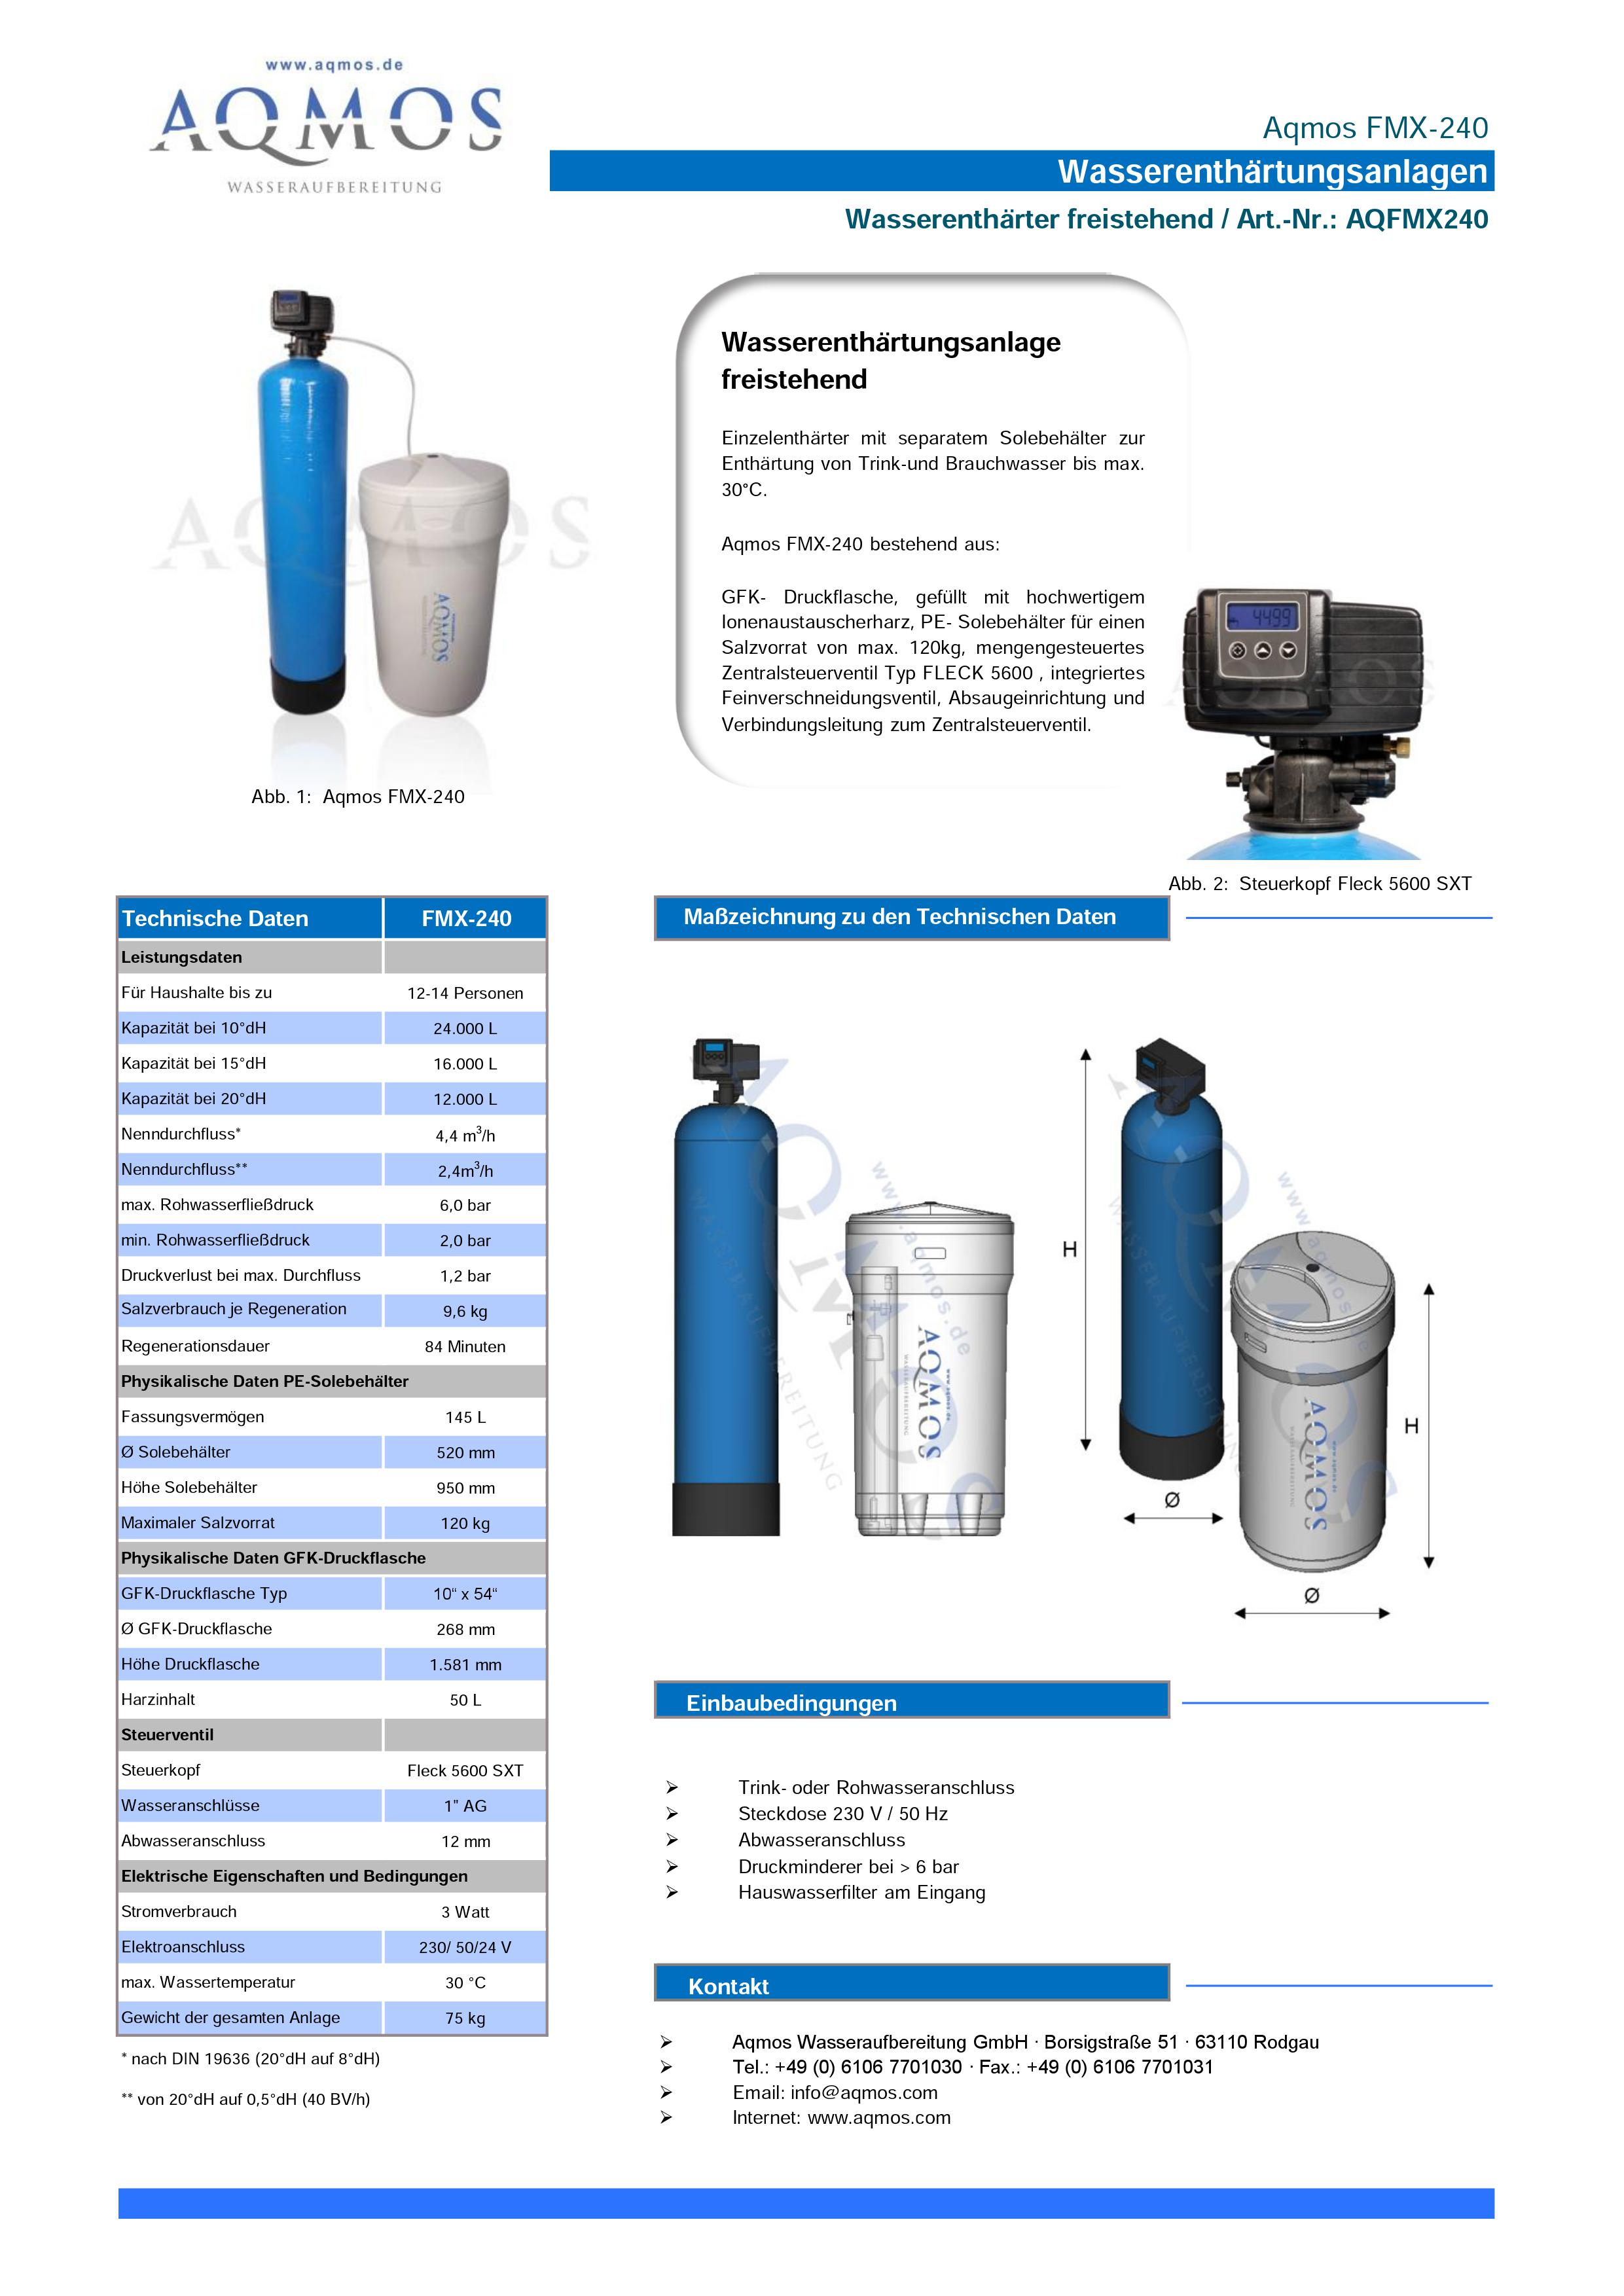 FMX-240-Datenblatt